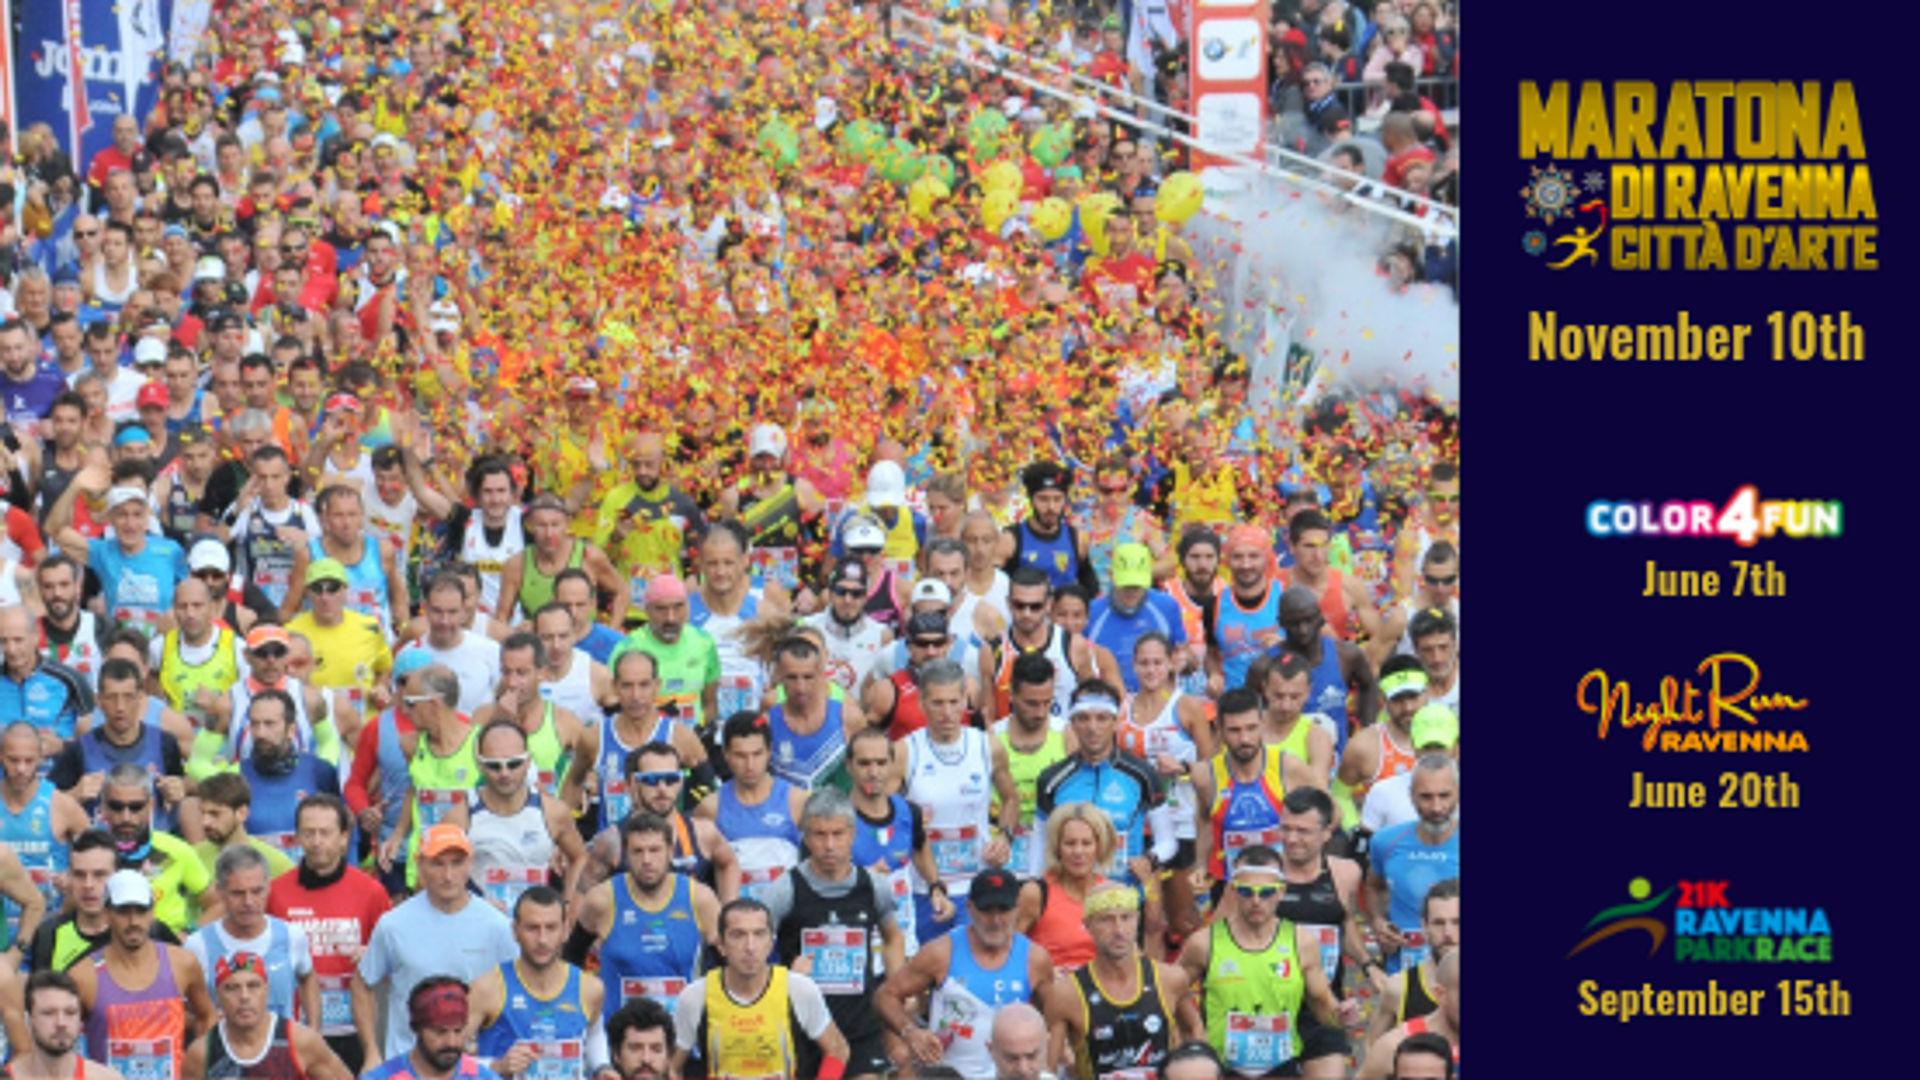 Mezza Maratona di Ravenna 21km